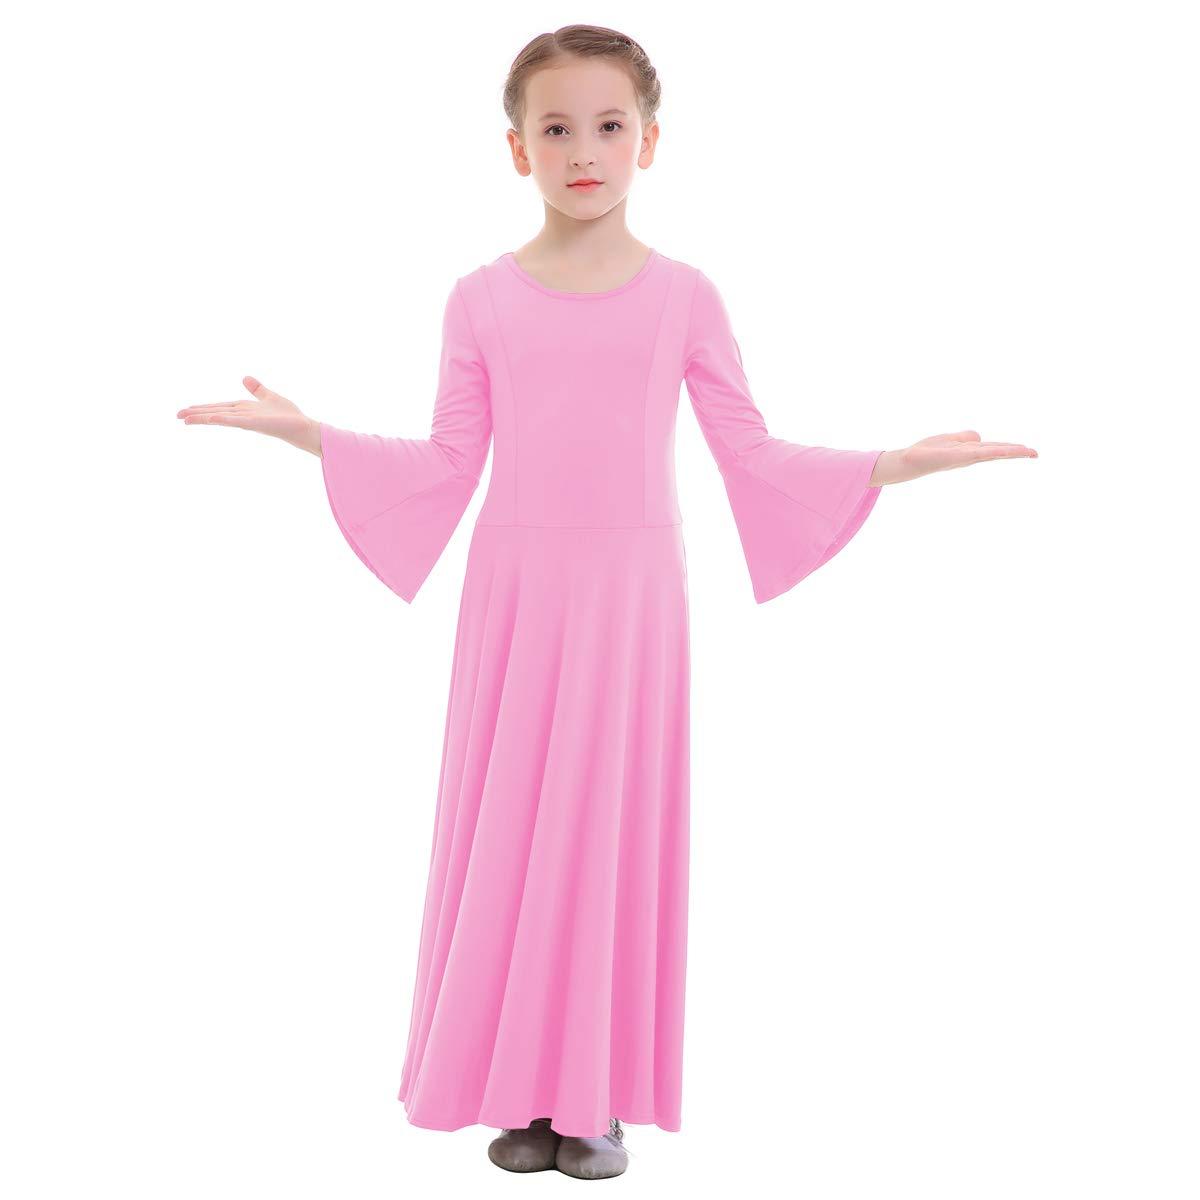 Kids Girls Liturgical Praise Lyrical Dance Bell Long Sleeve Dress Loose Fit Full Length Costume Praisewear